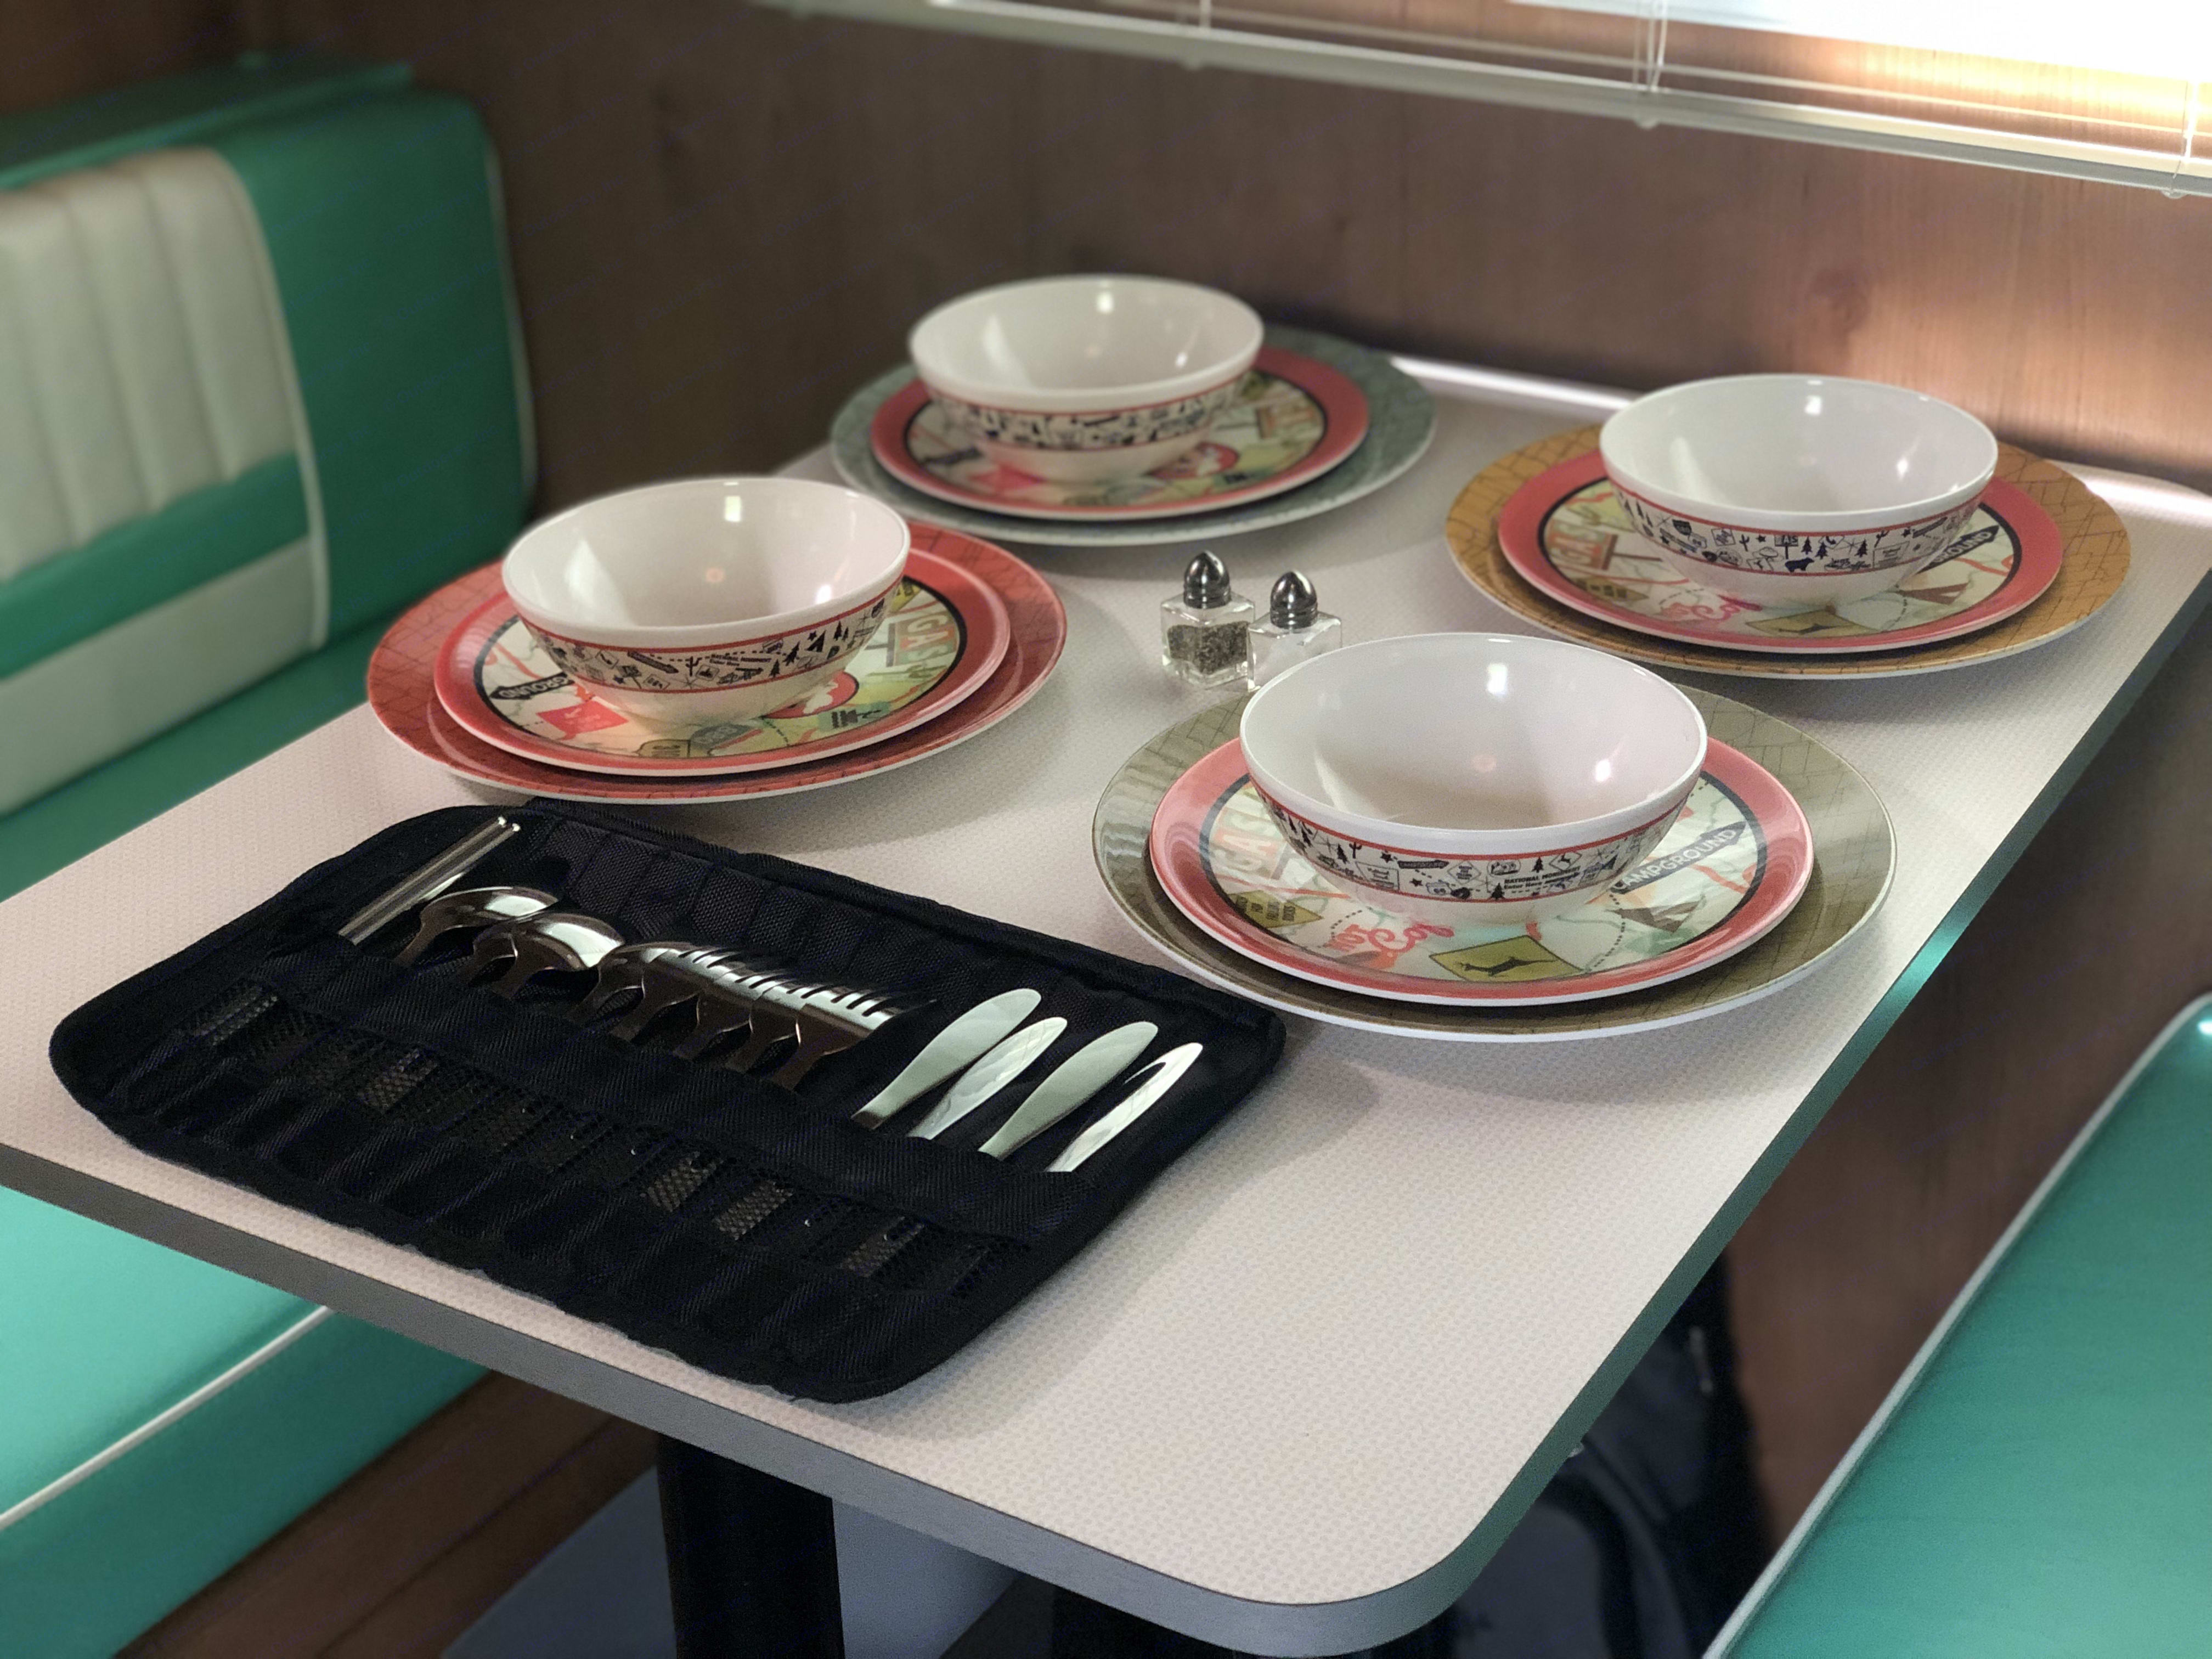 Table setting for four. Riverside Rv Retro 2019